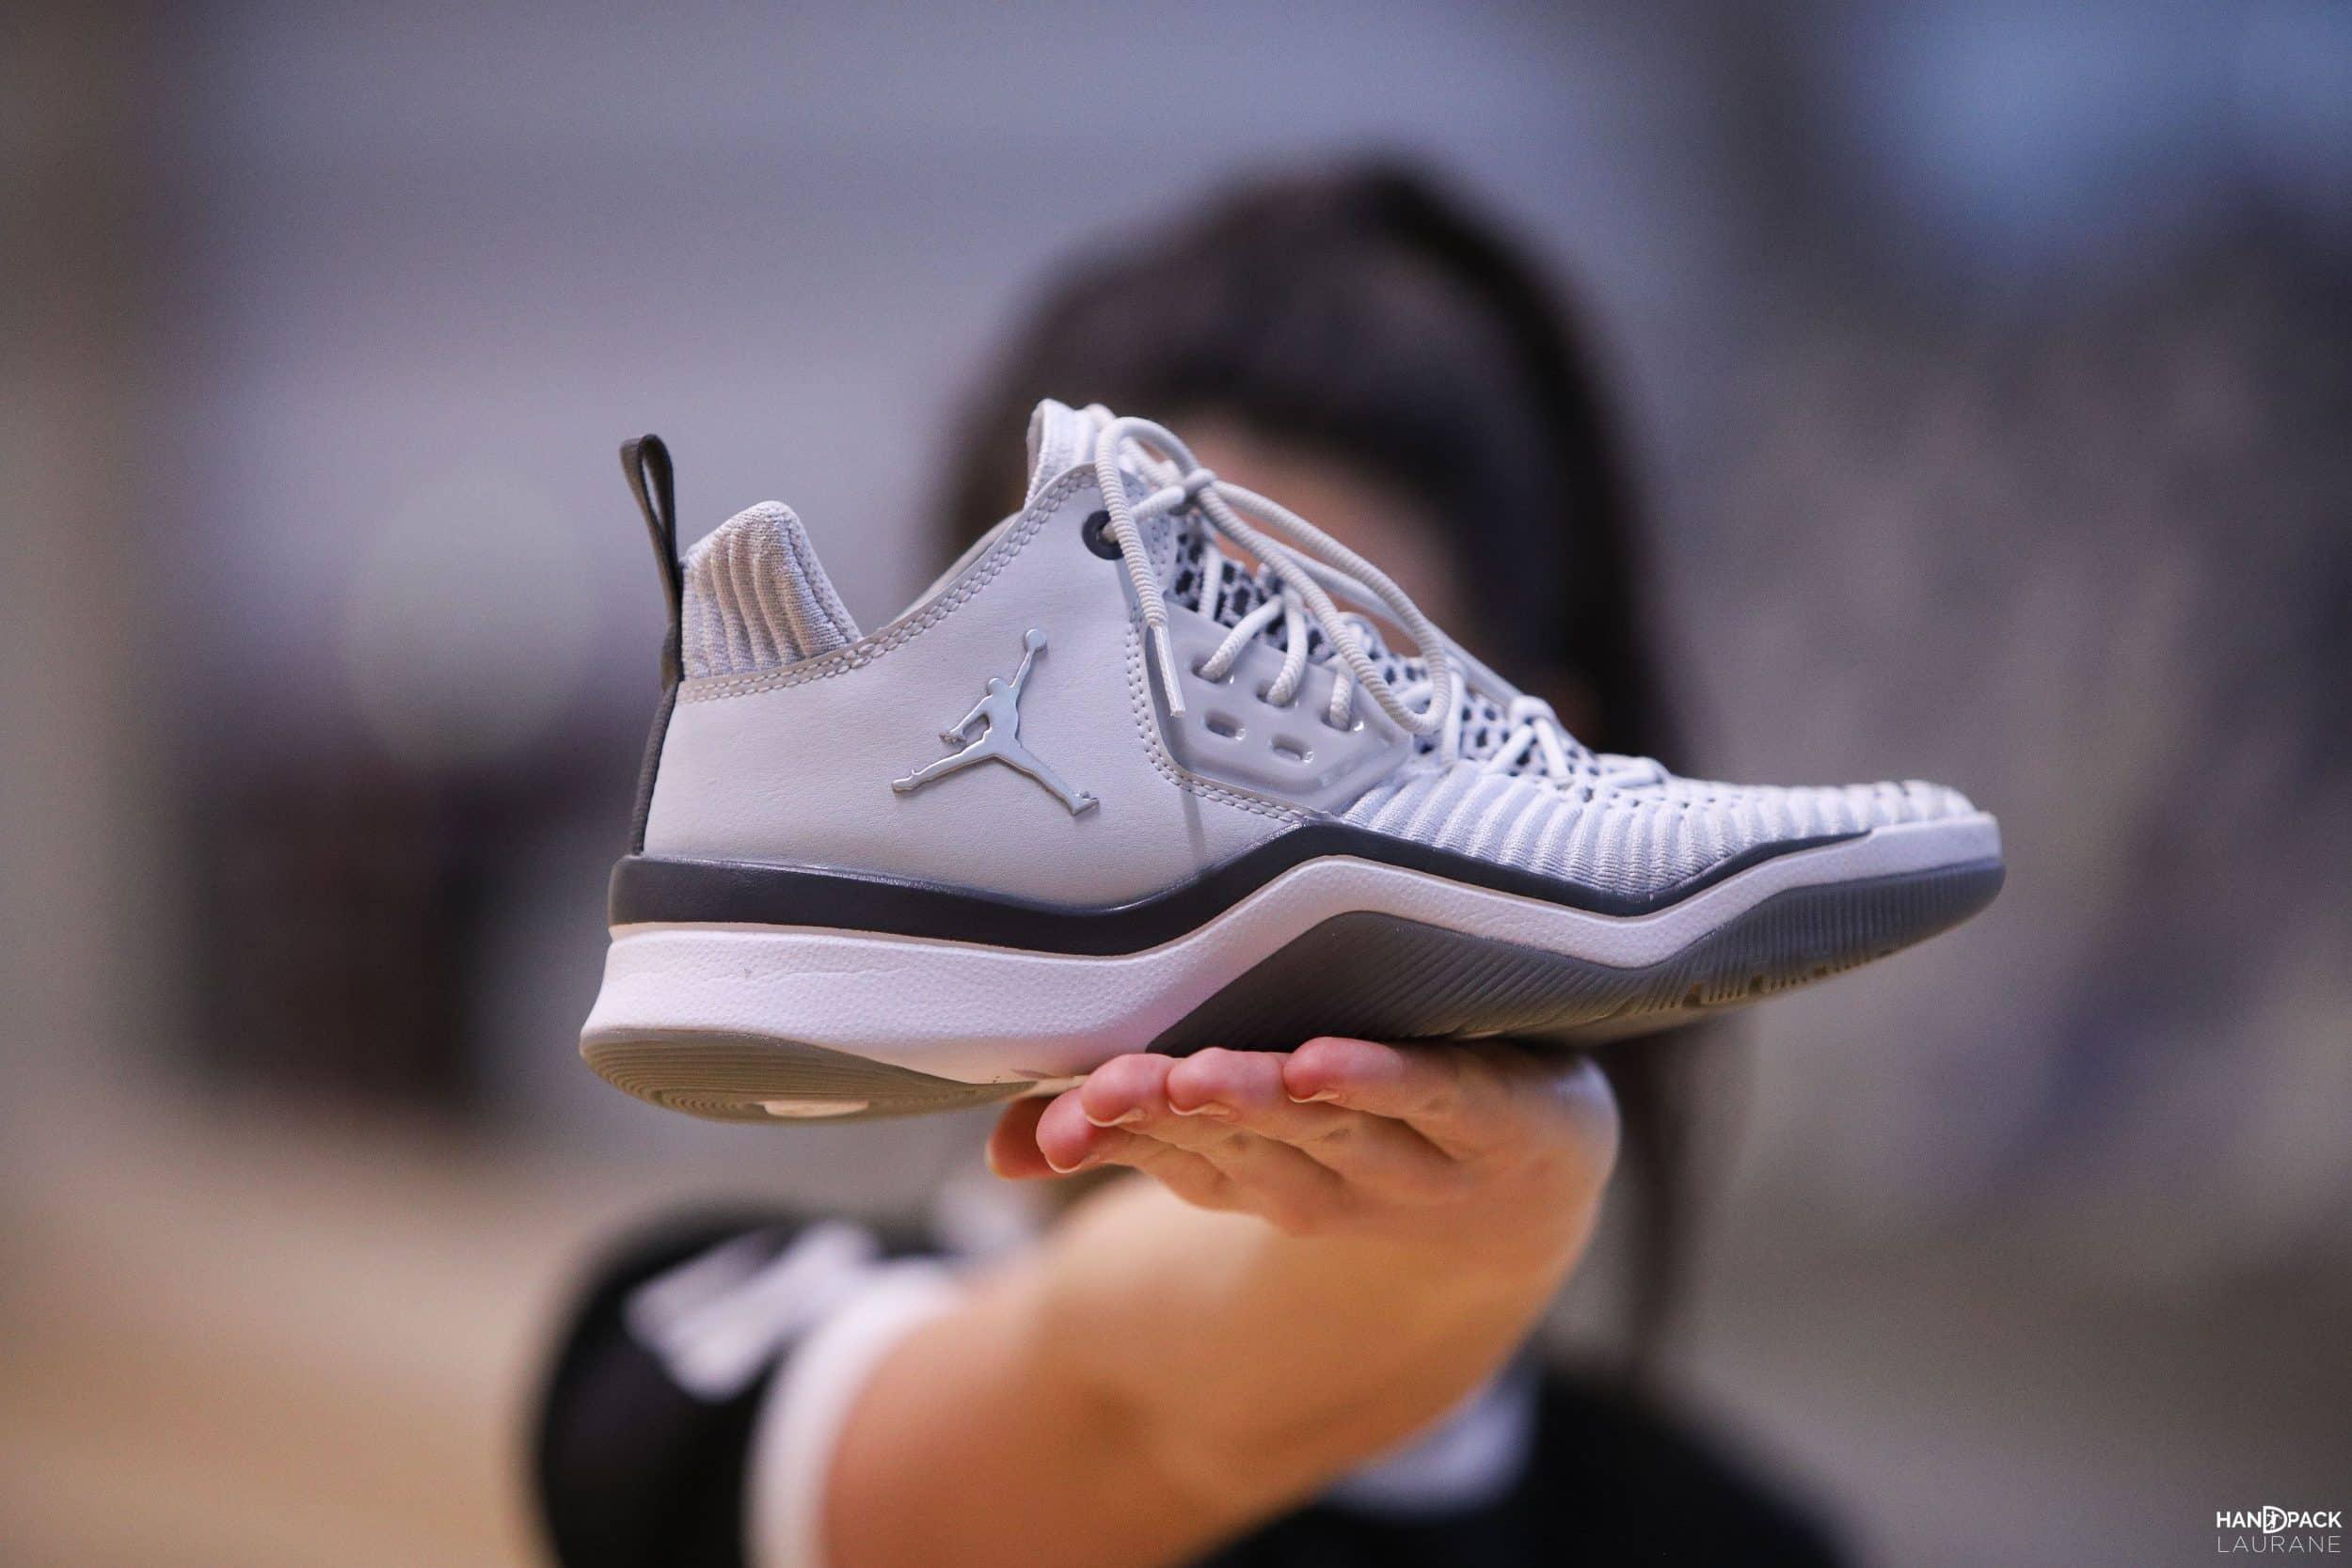 Test des Air Jordan DNA LX